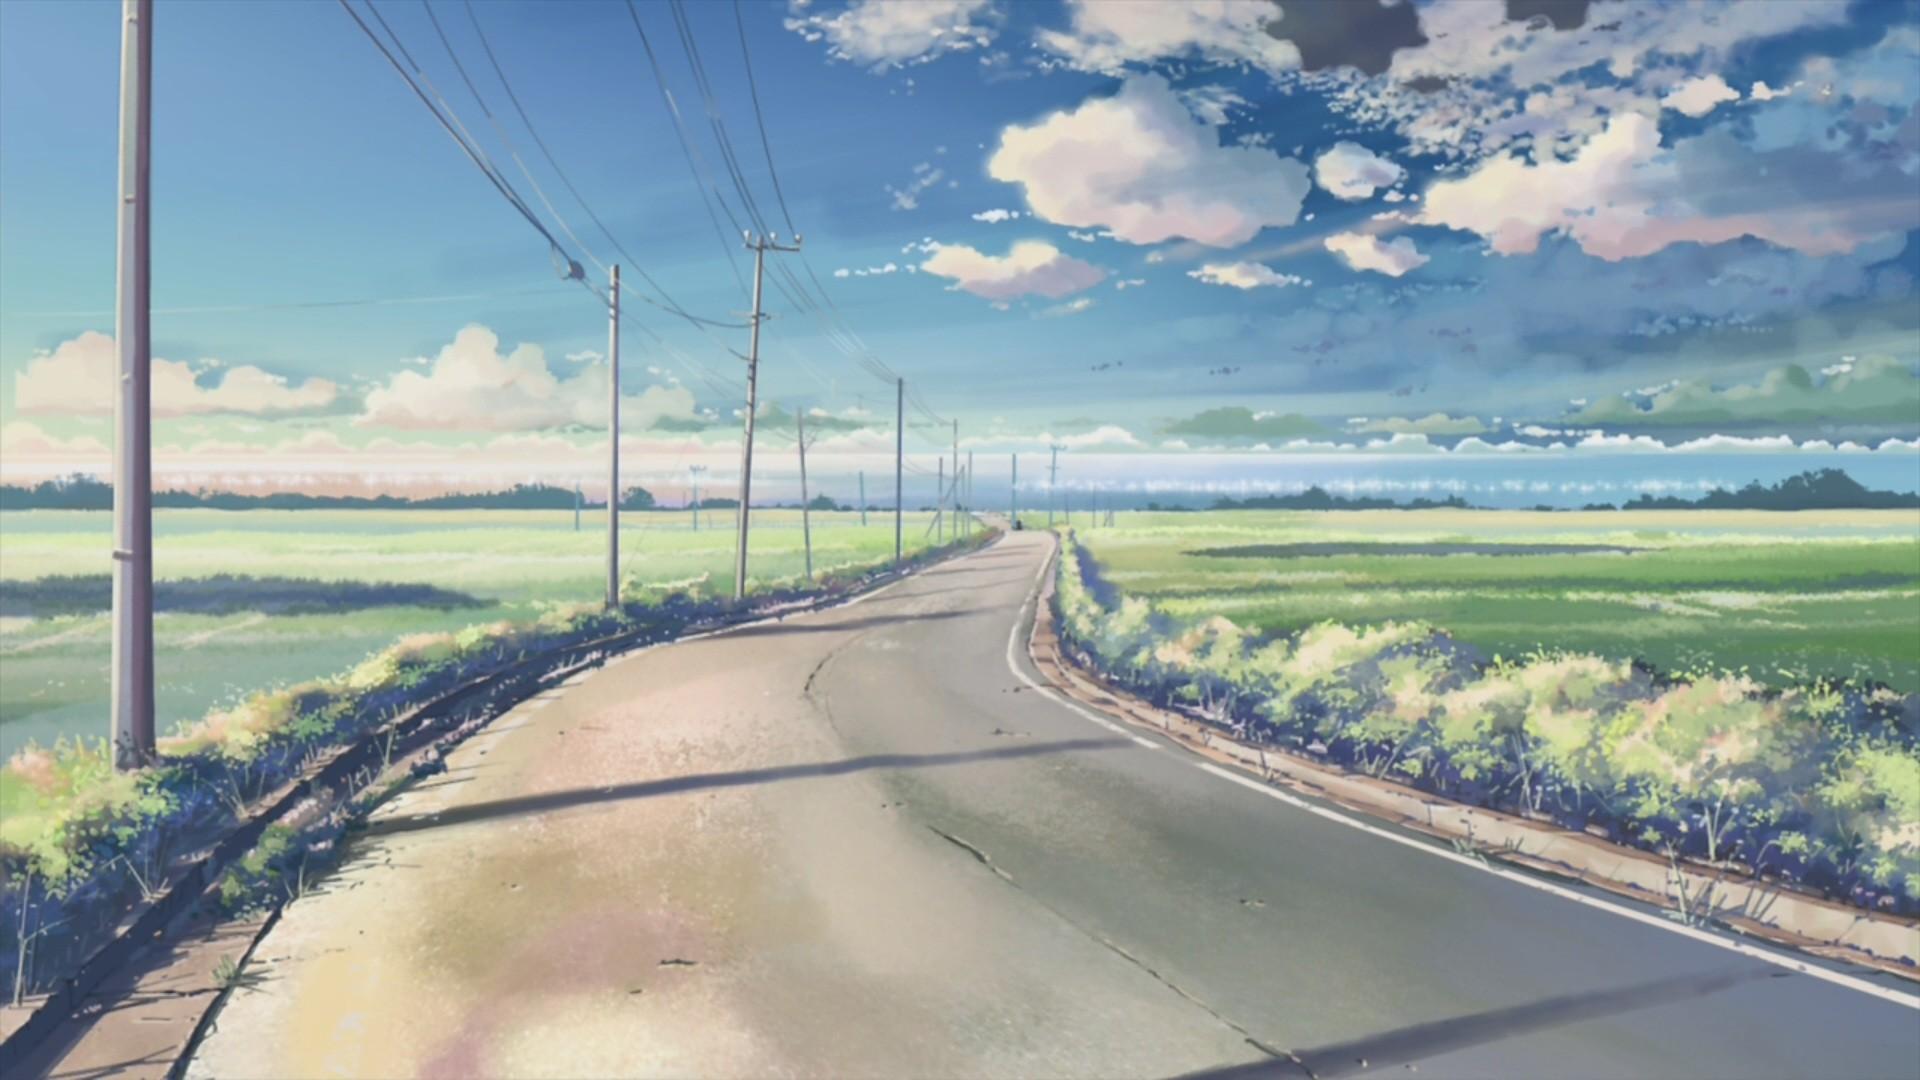 still a long way to go · Scenery WallpaperWallpaper Backgrounds WallpapersAnime …